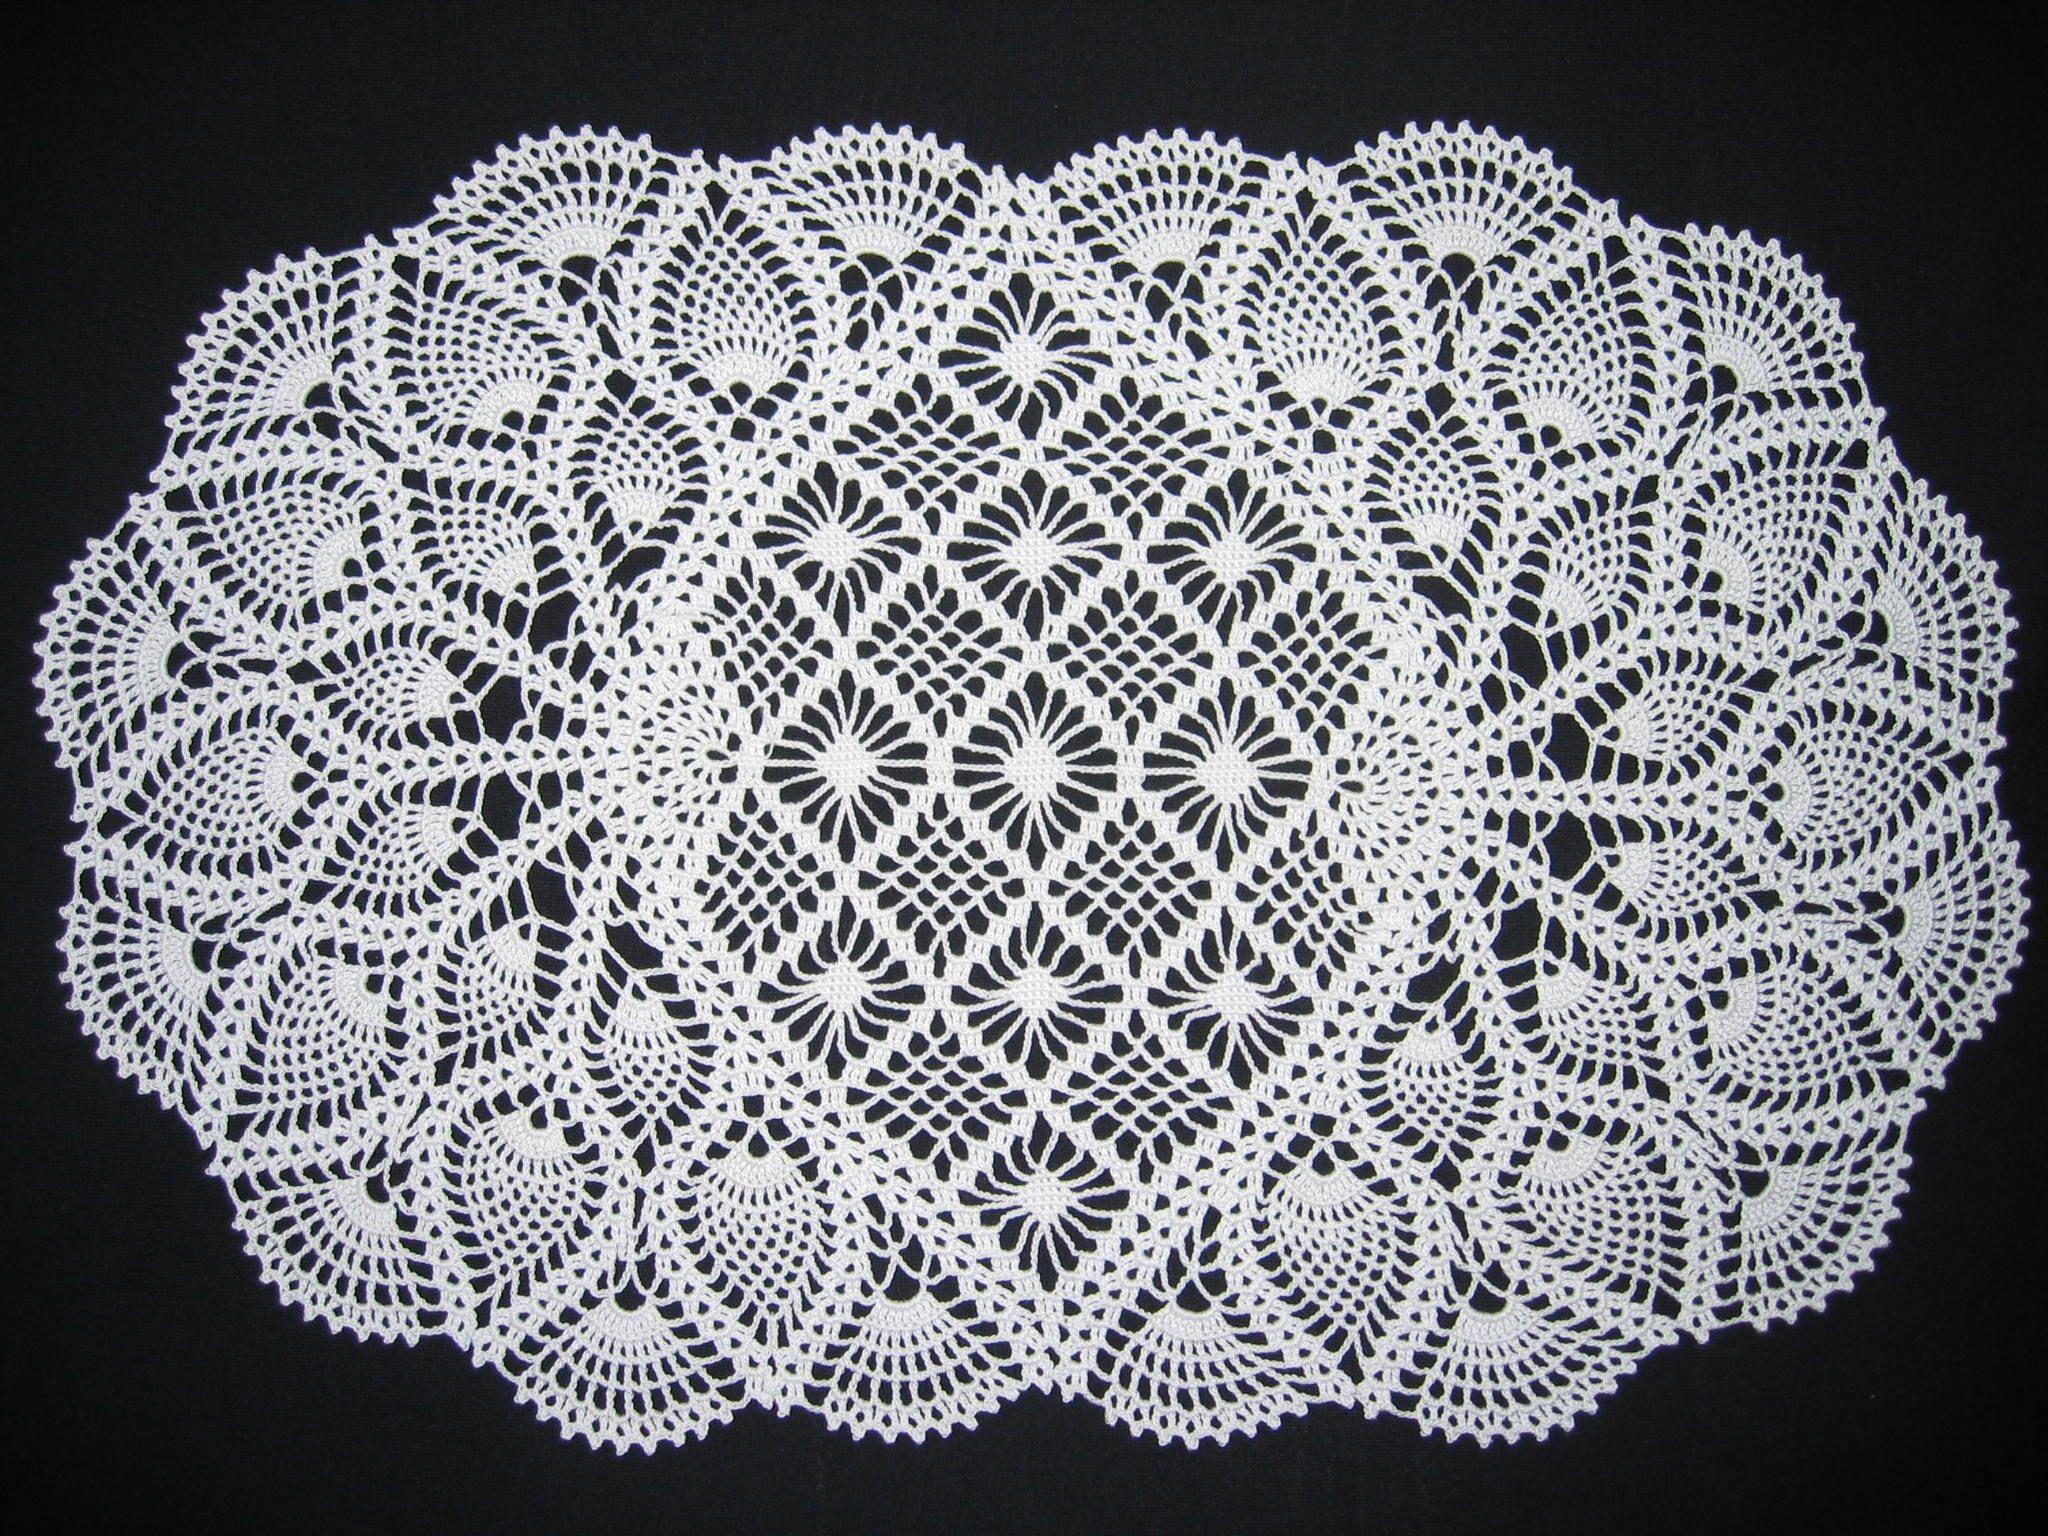 Oval crochet pineapple doily   Round crochet tablecloth   Pinterest ...